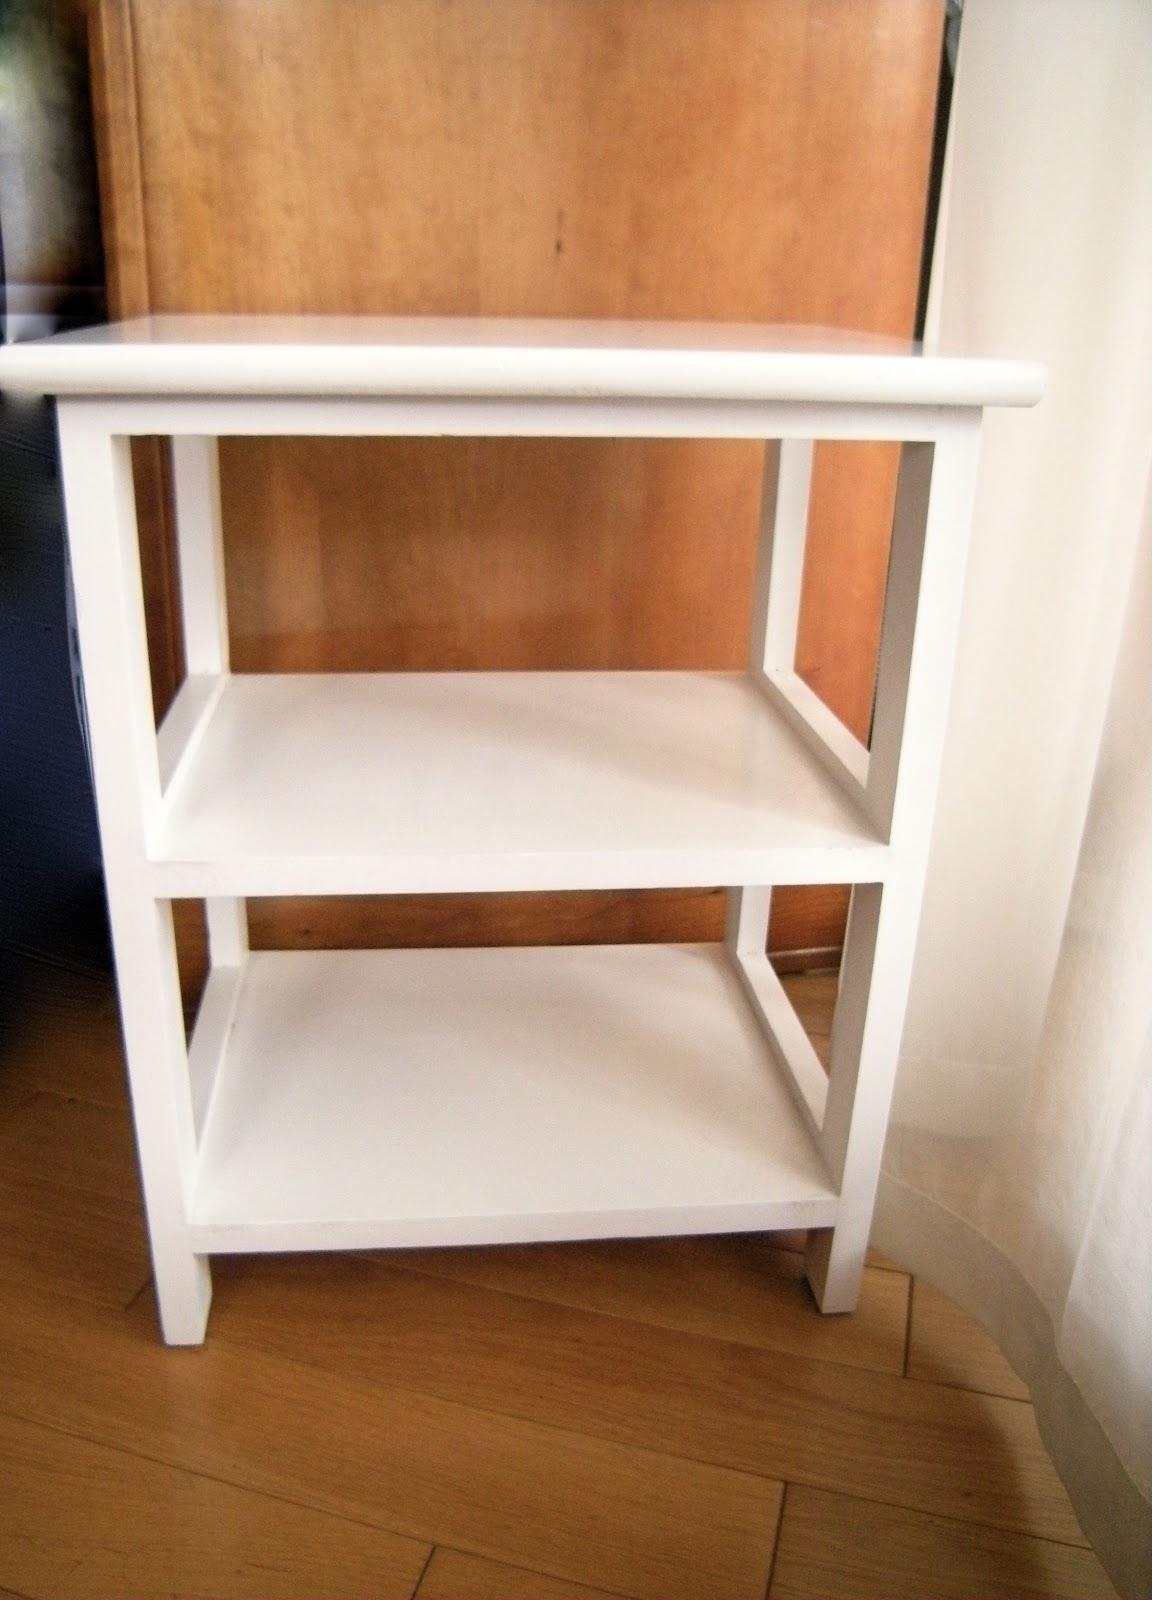 dam 39 oizelle diy relooker un meuble avec du masking tape. Black Bedroom Furniture Sets. Home Design Ideas